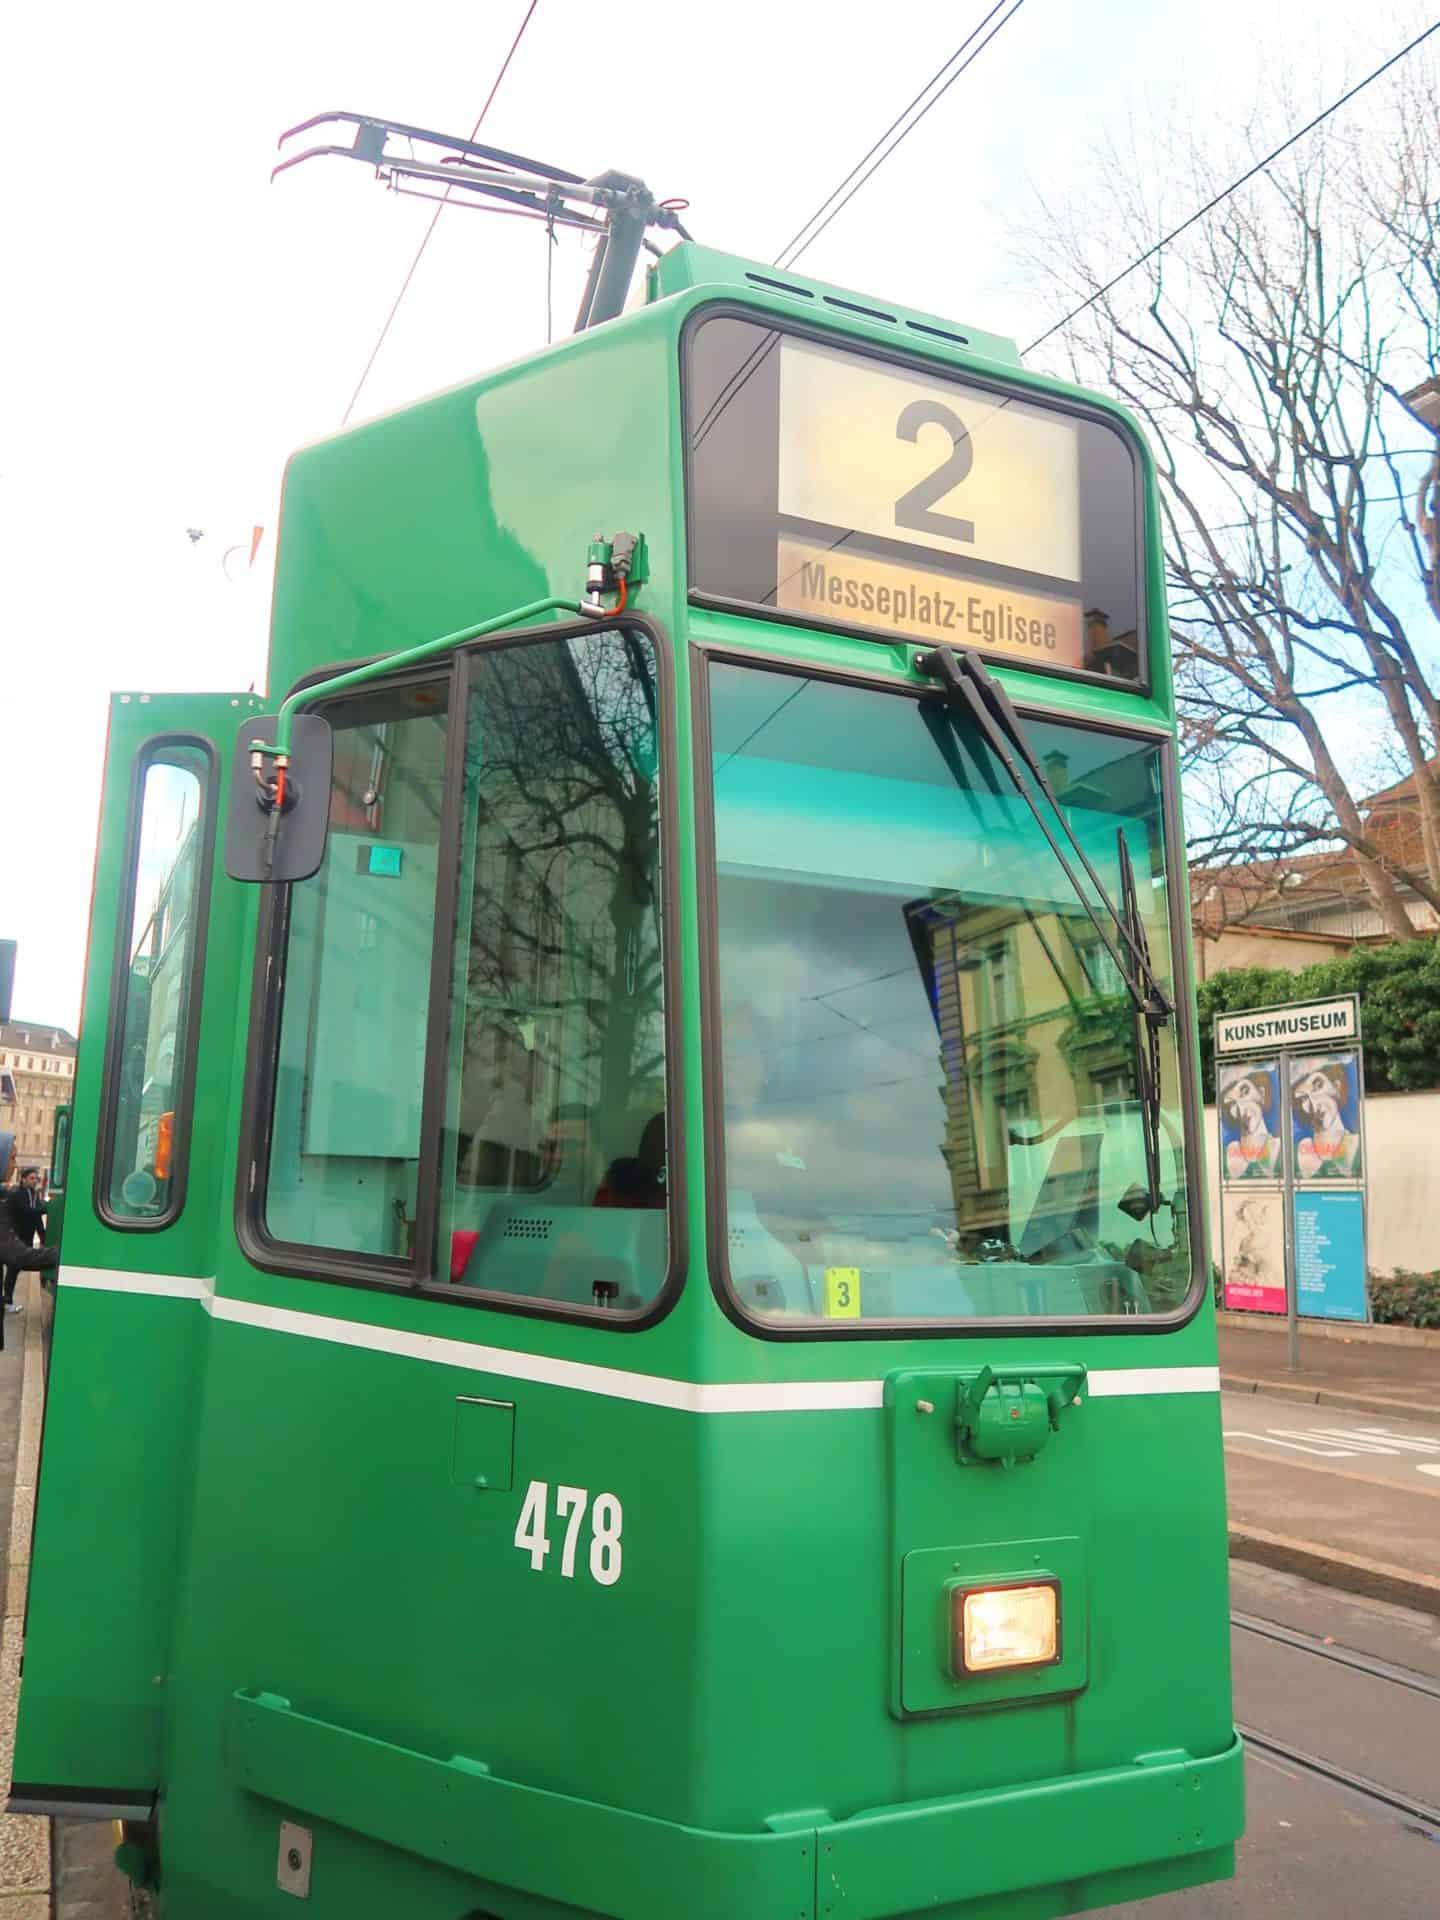 basel switzerland city guide tram